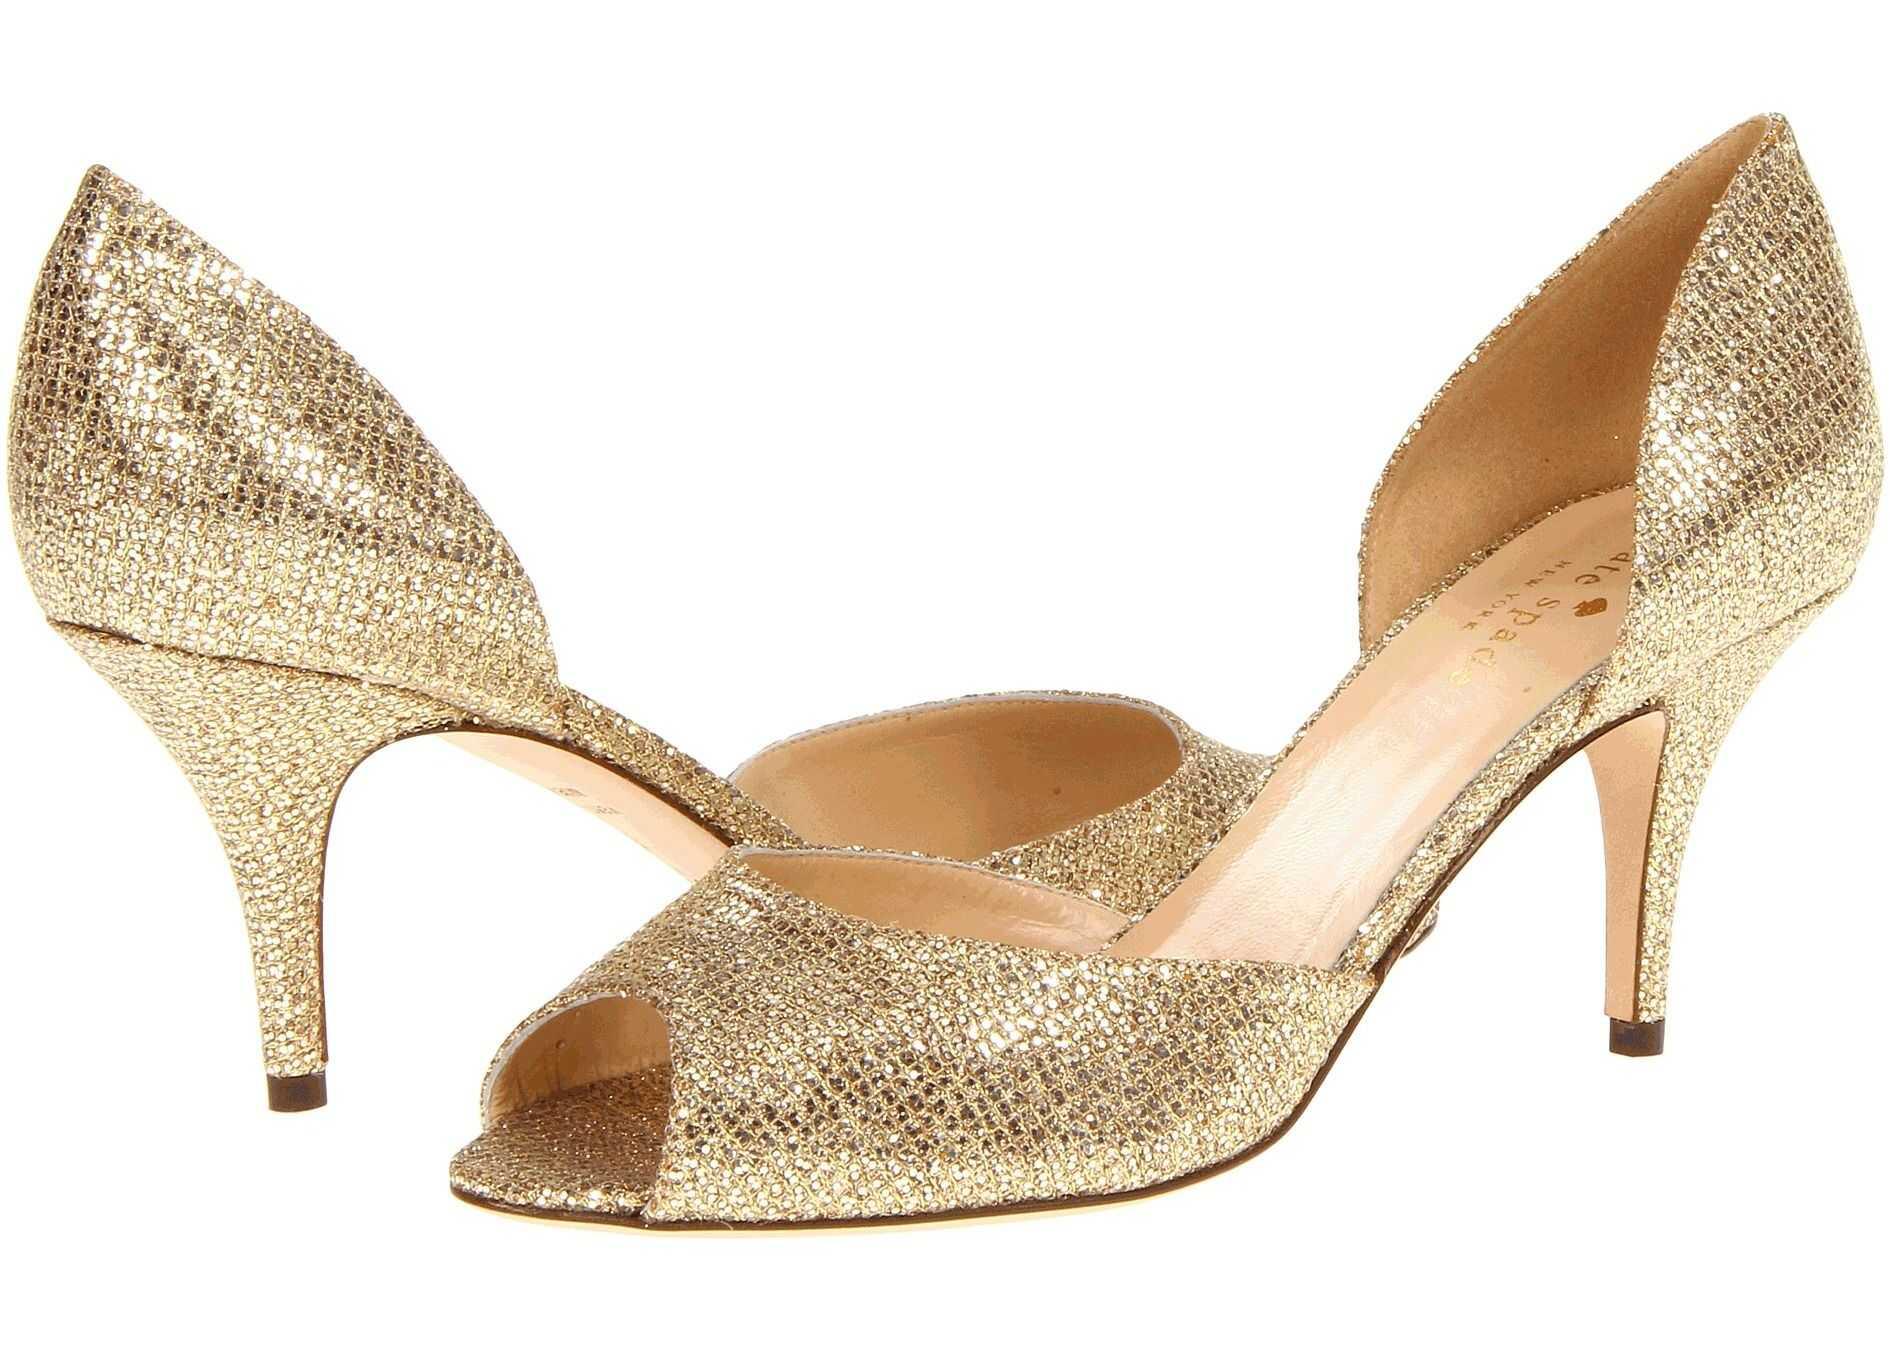 Kate Spade New York Sage* Gold Starlight